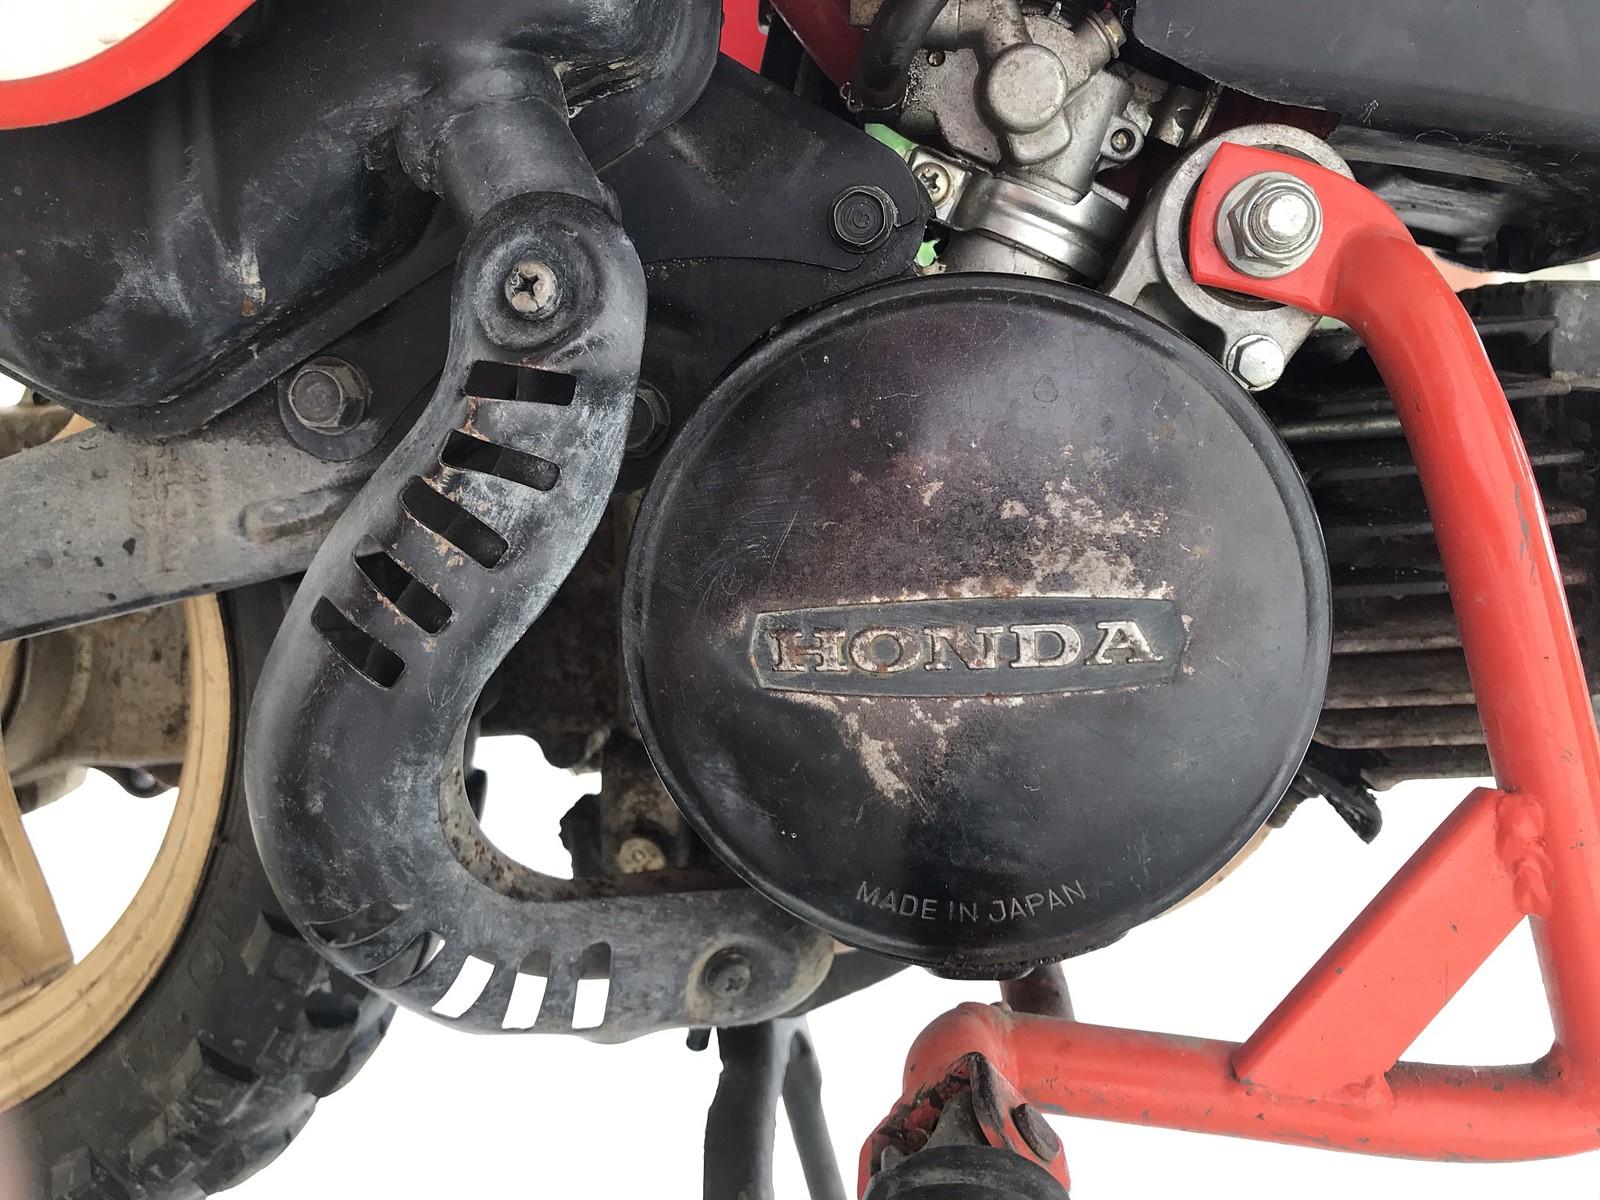 B942BC31-5AA8-4D06-98FD-EAEF3BE1C3DE - Godcho - Motocross Pictures - Vital MX